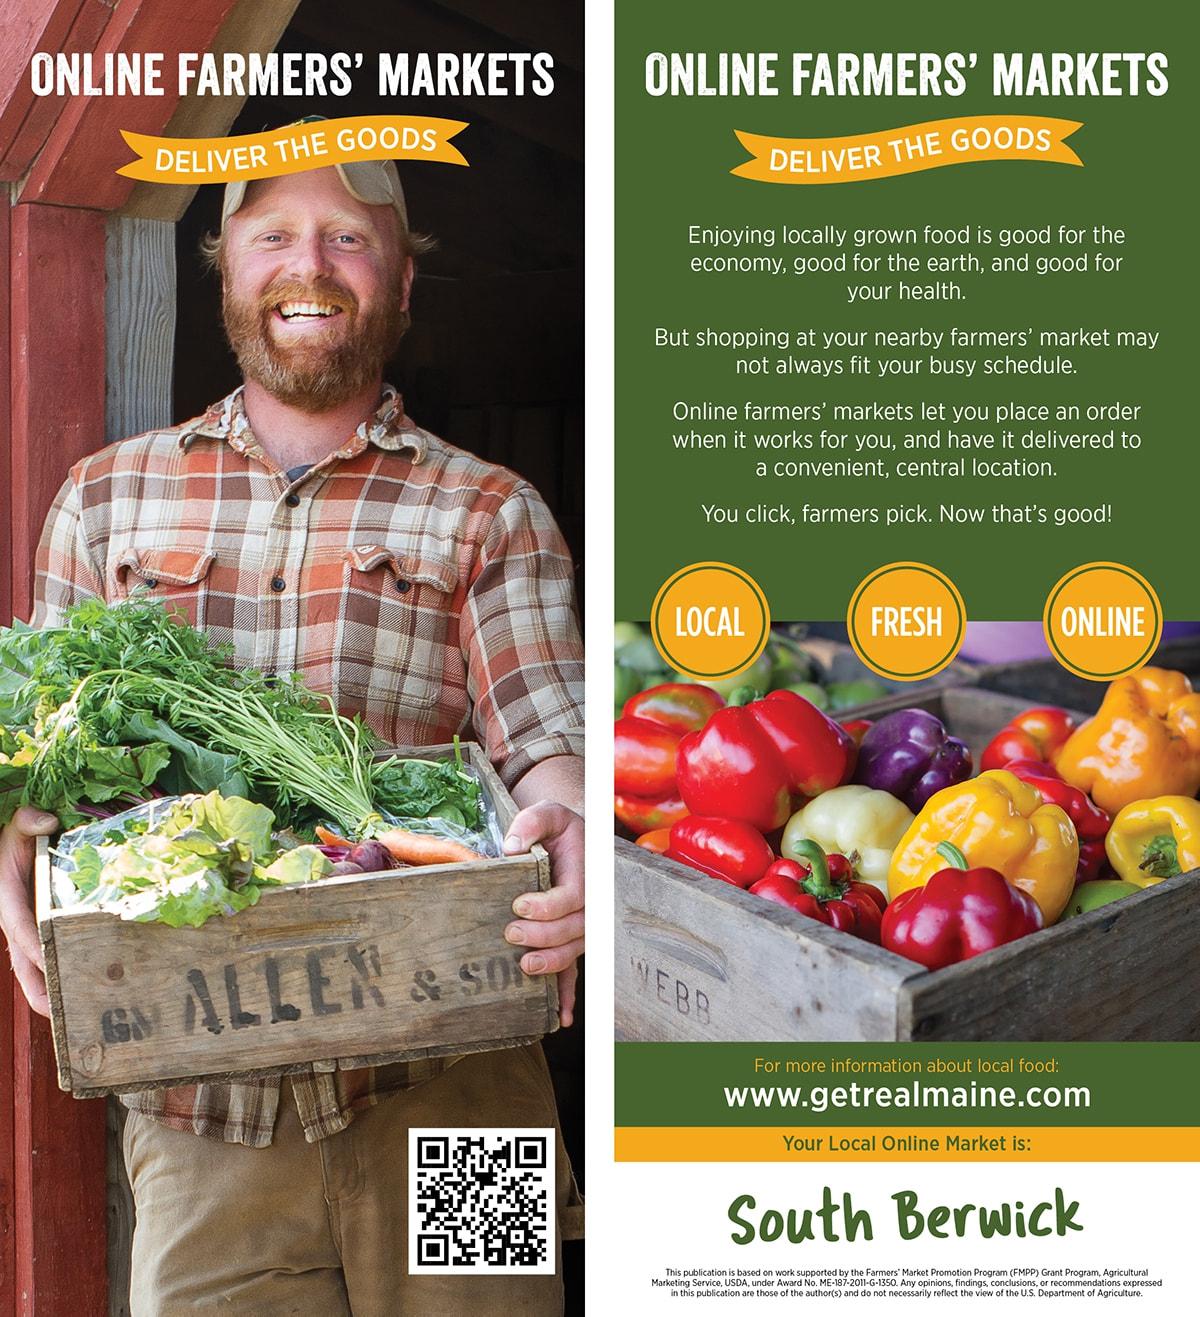 Online Farmers Markets Rackcard 2 Sw